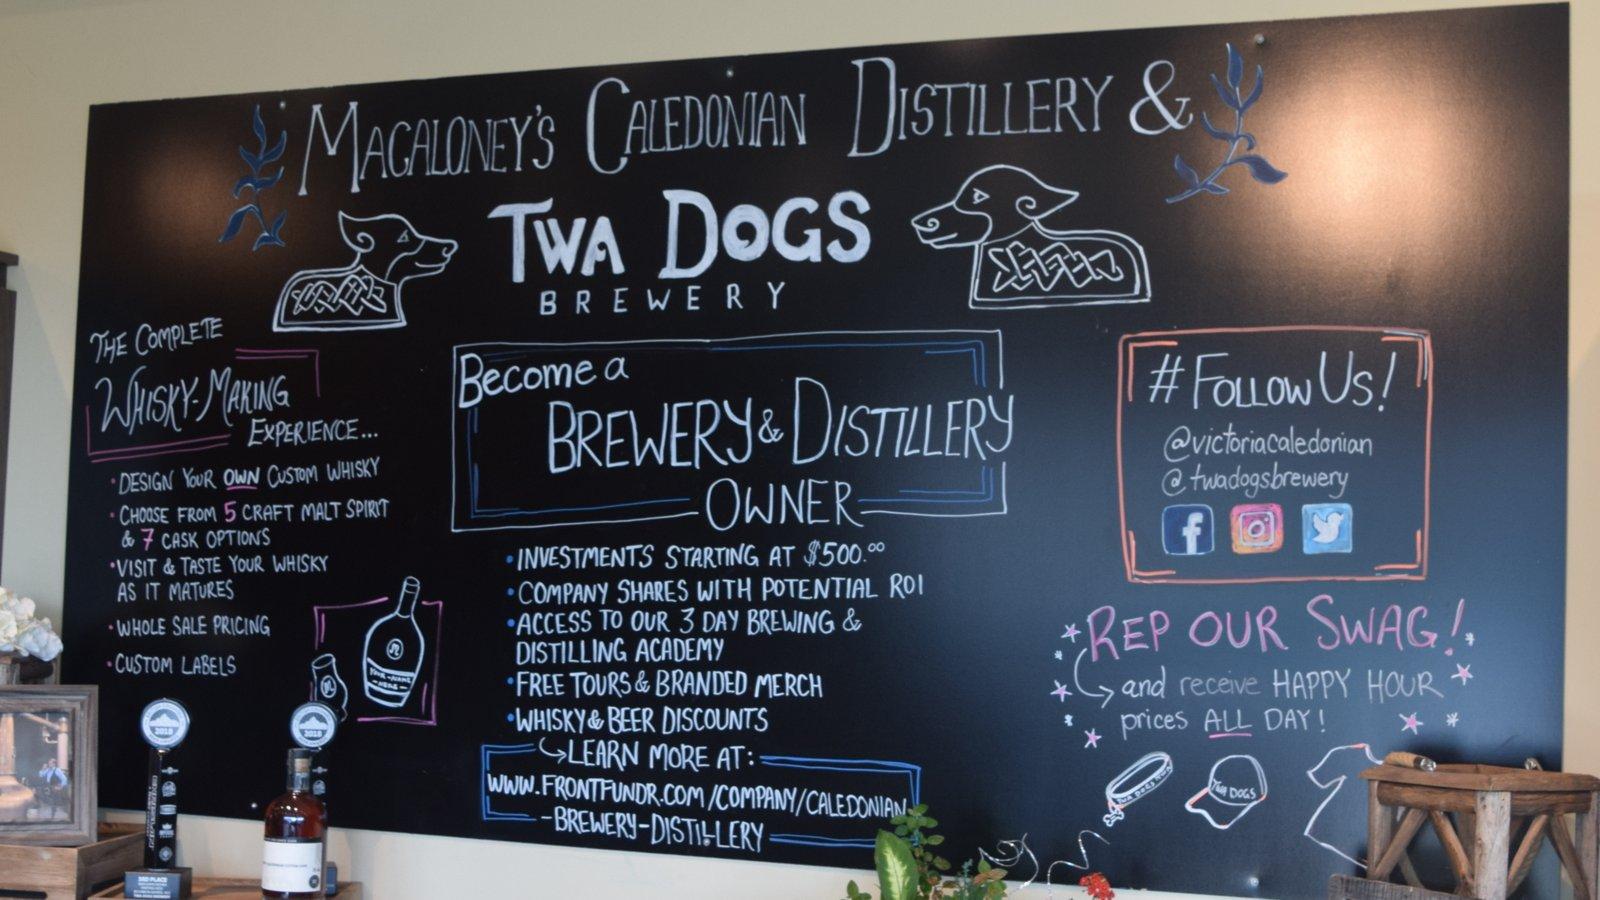 Victoria Caledonian: Distilling Success At One Of BC's Hidden Gem Breweries